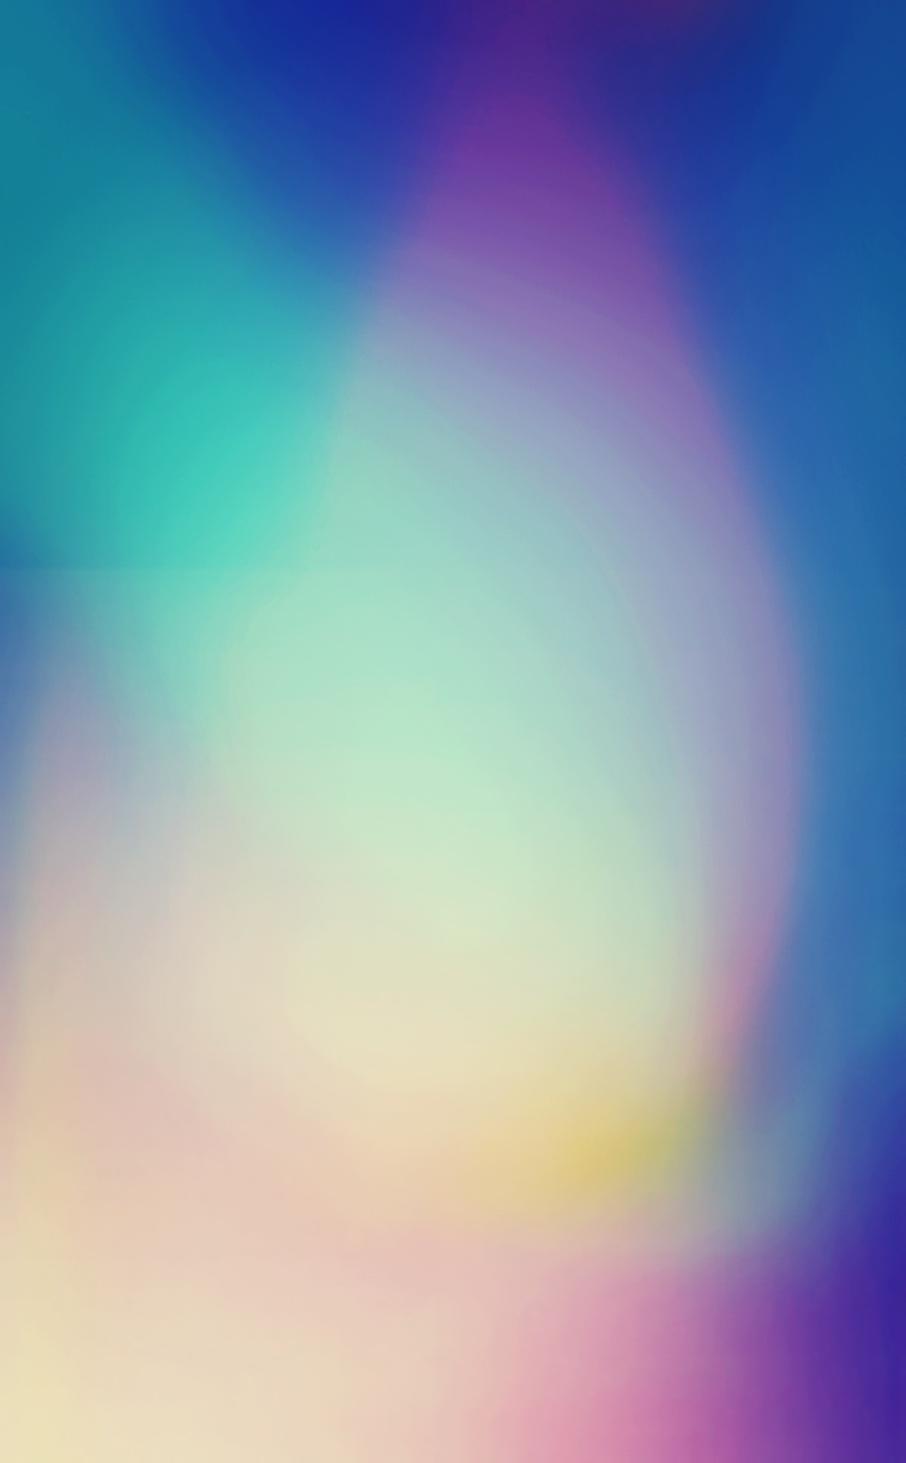 subtle-cool-gradient-iphone-wallpaper